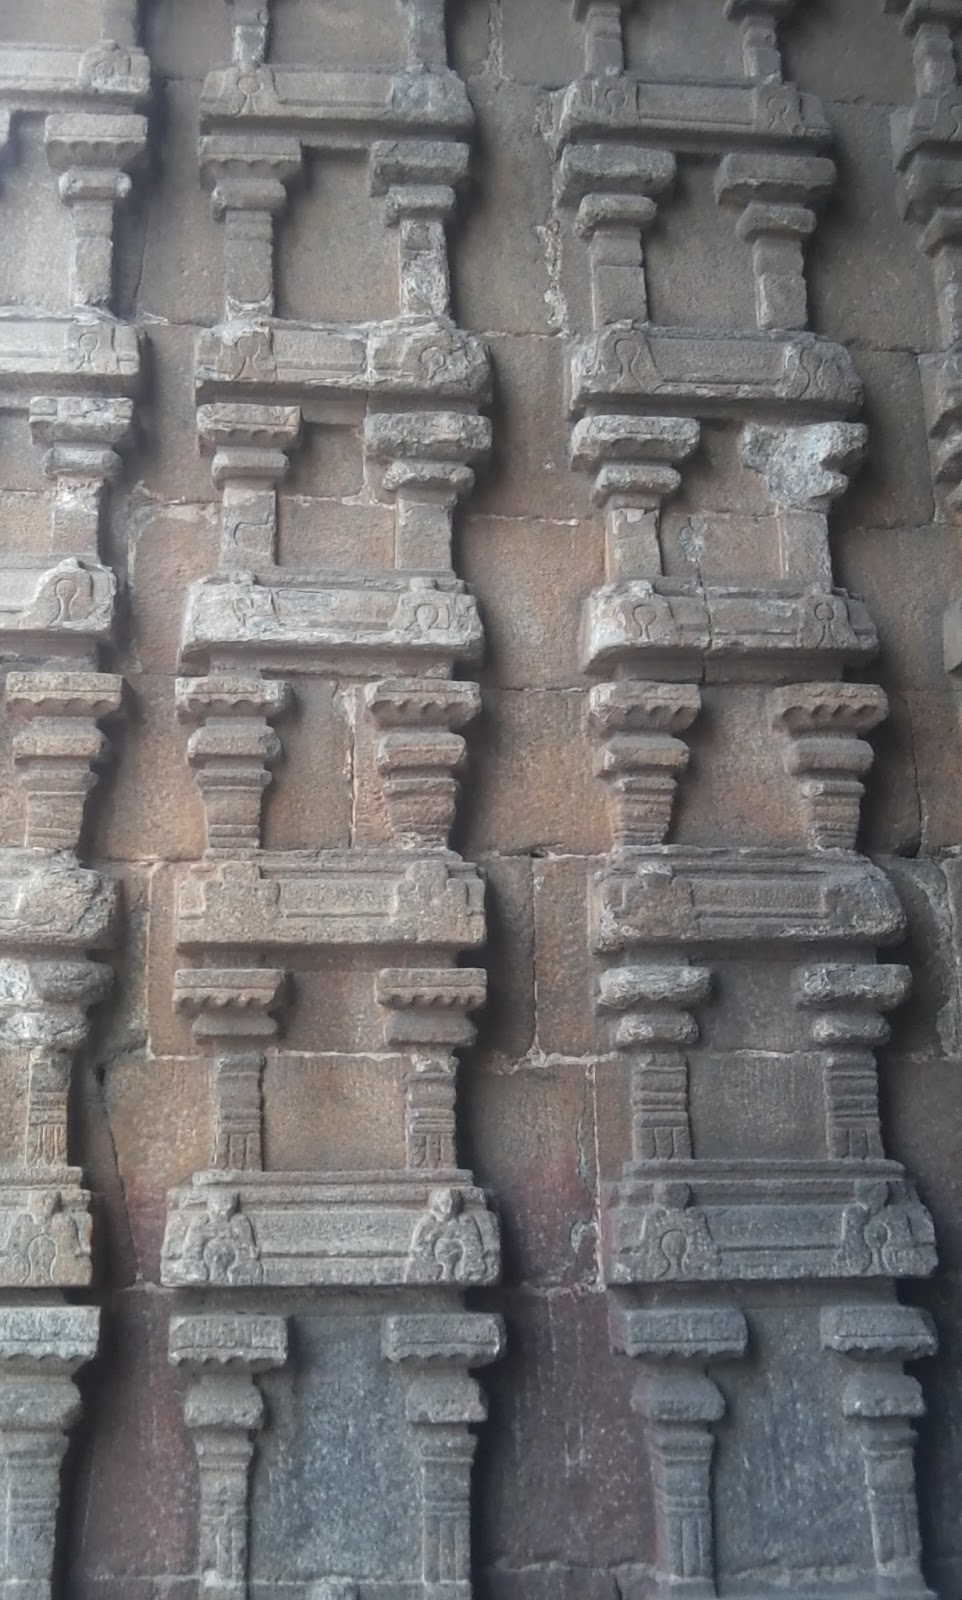 Siddhar samadhi in bangalore dating 2